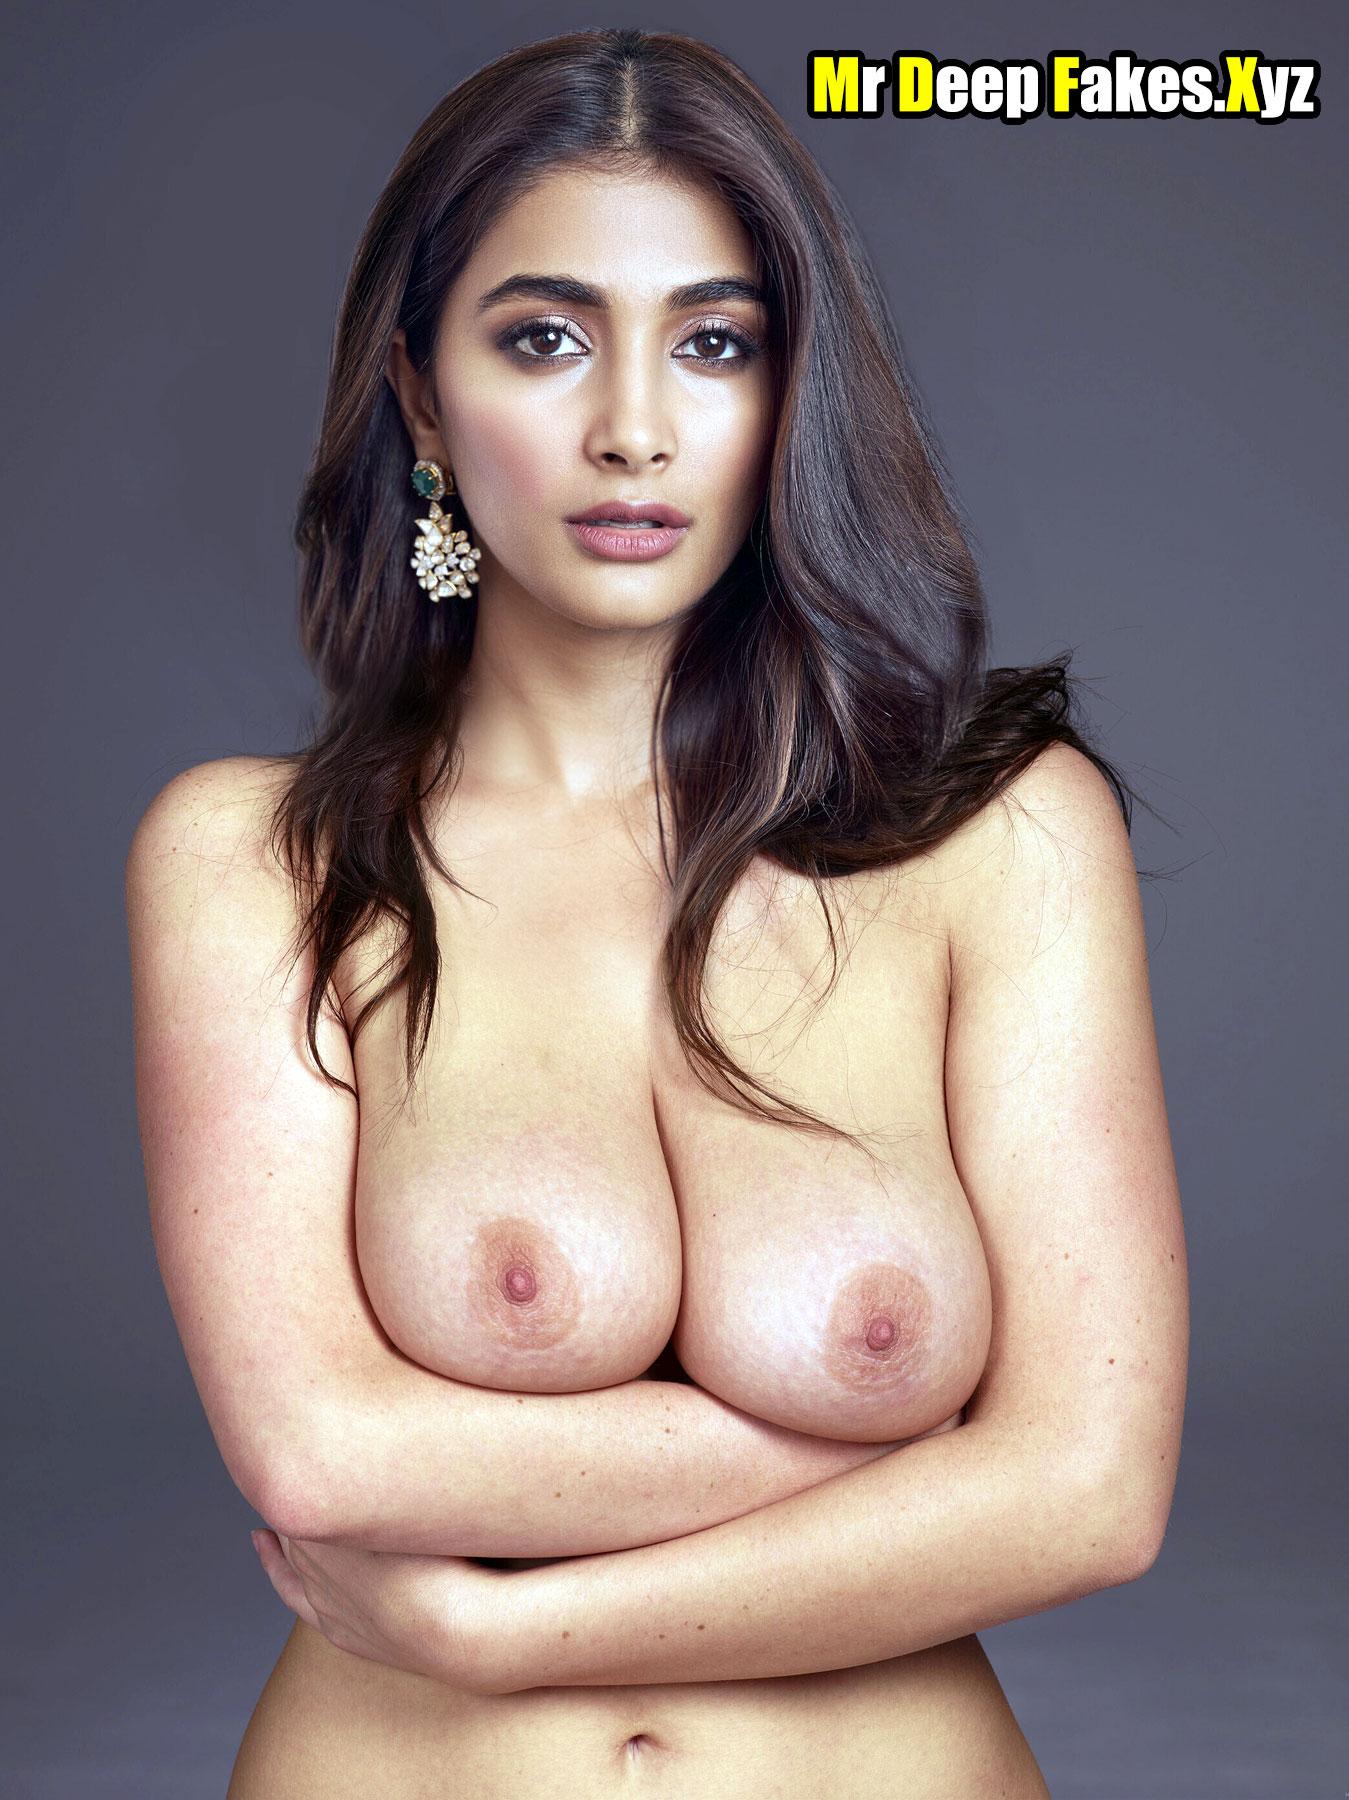 Heroine Pooja Hegde busty boobs nipple studio photoshoot without bra